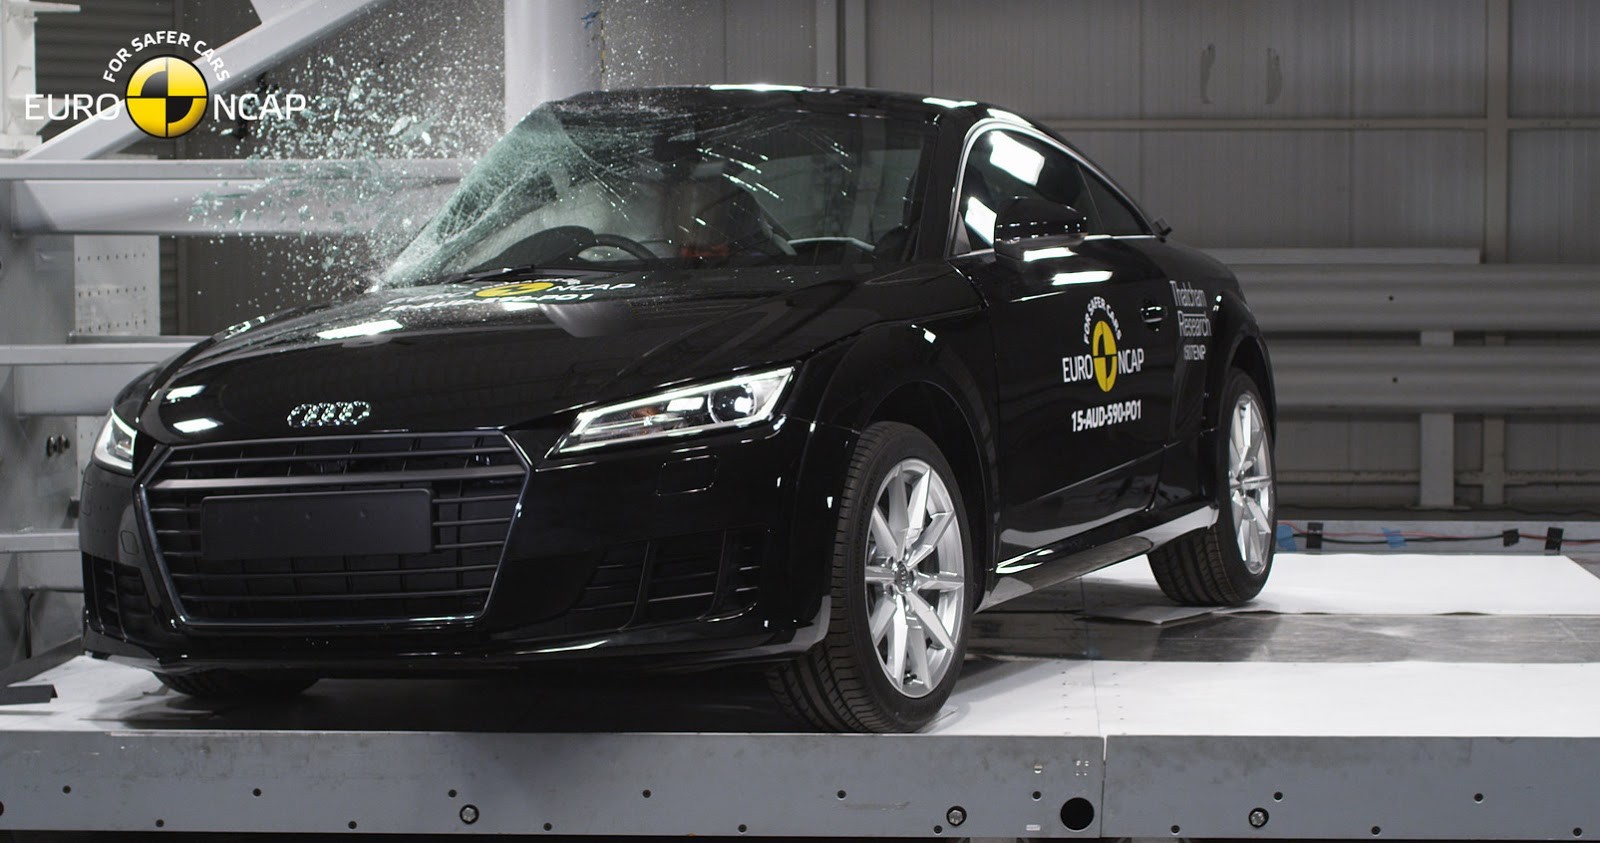 Audi TT EuroNCAP